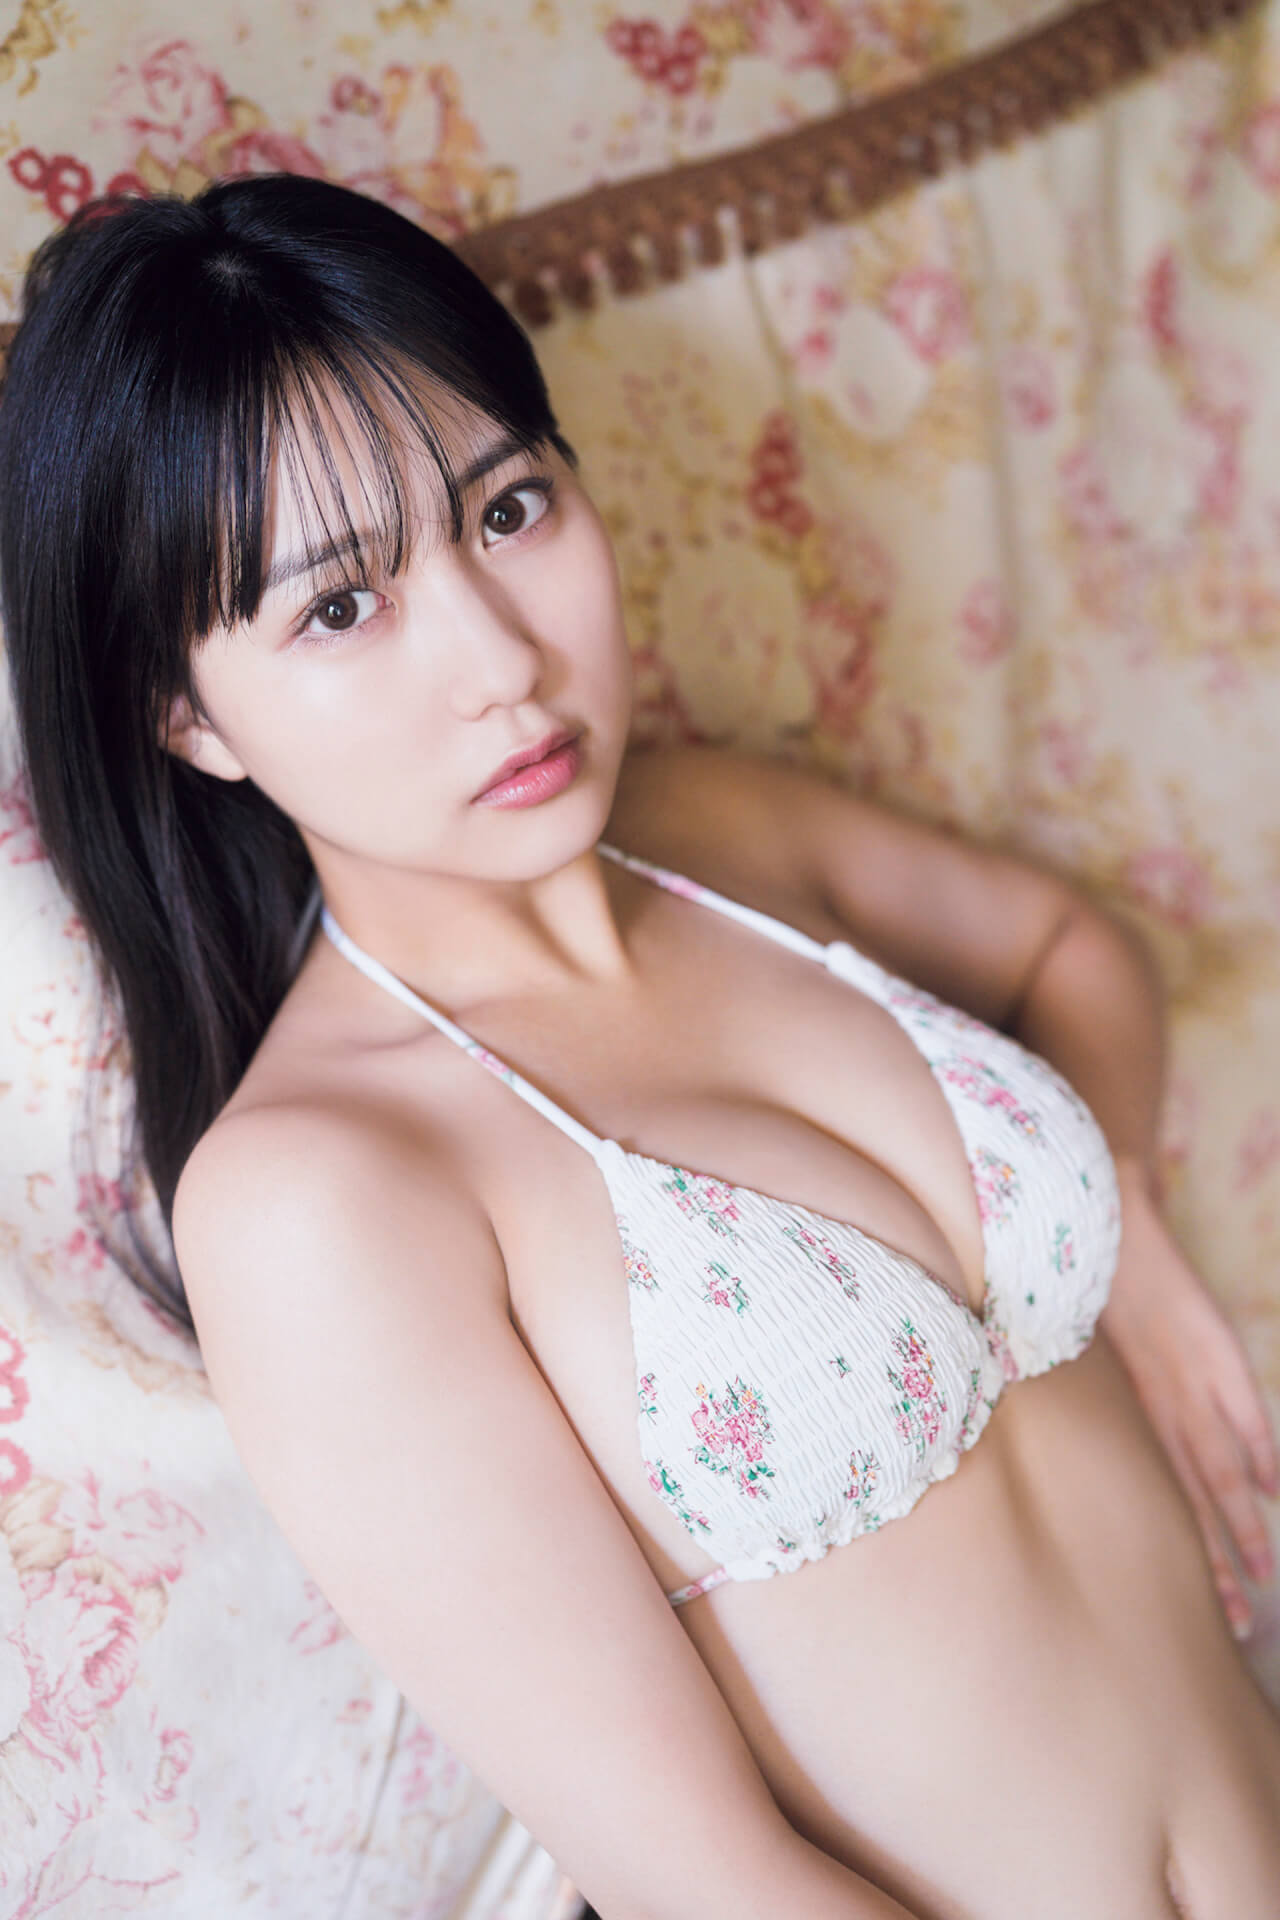 HKT48田中美久がソログラビアで美ボディ映える水着姿を披露!『B.L.T.2021年12月号増刊ソログラビアSP版』が発売決定 art211011_tanakamiku_4